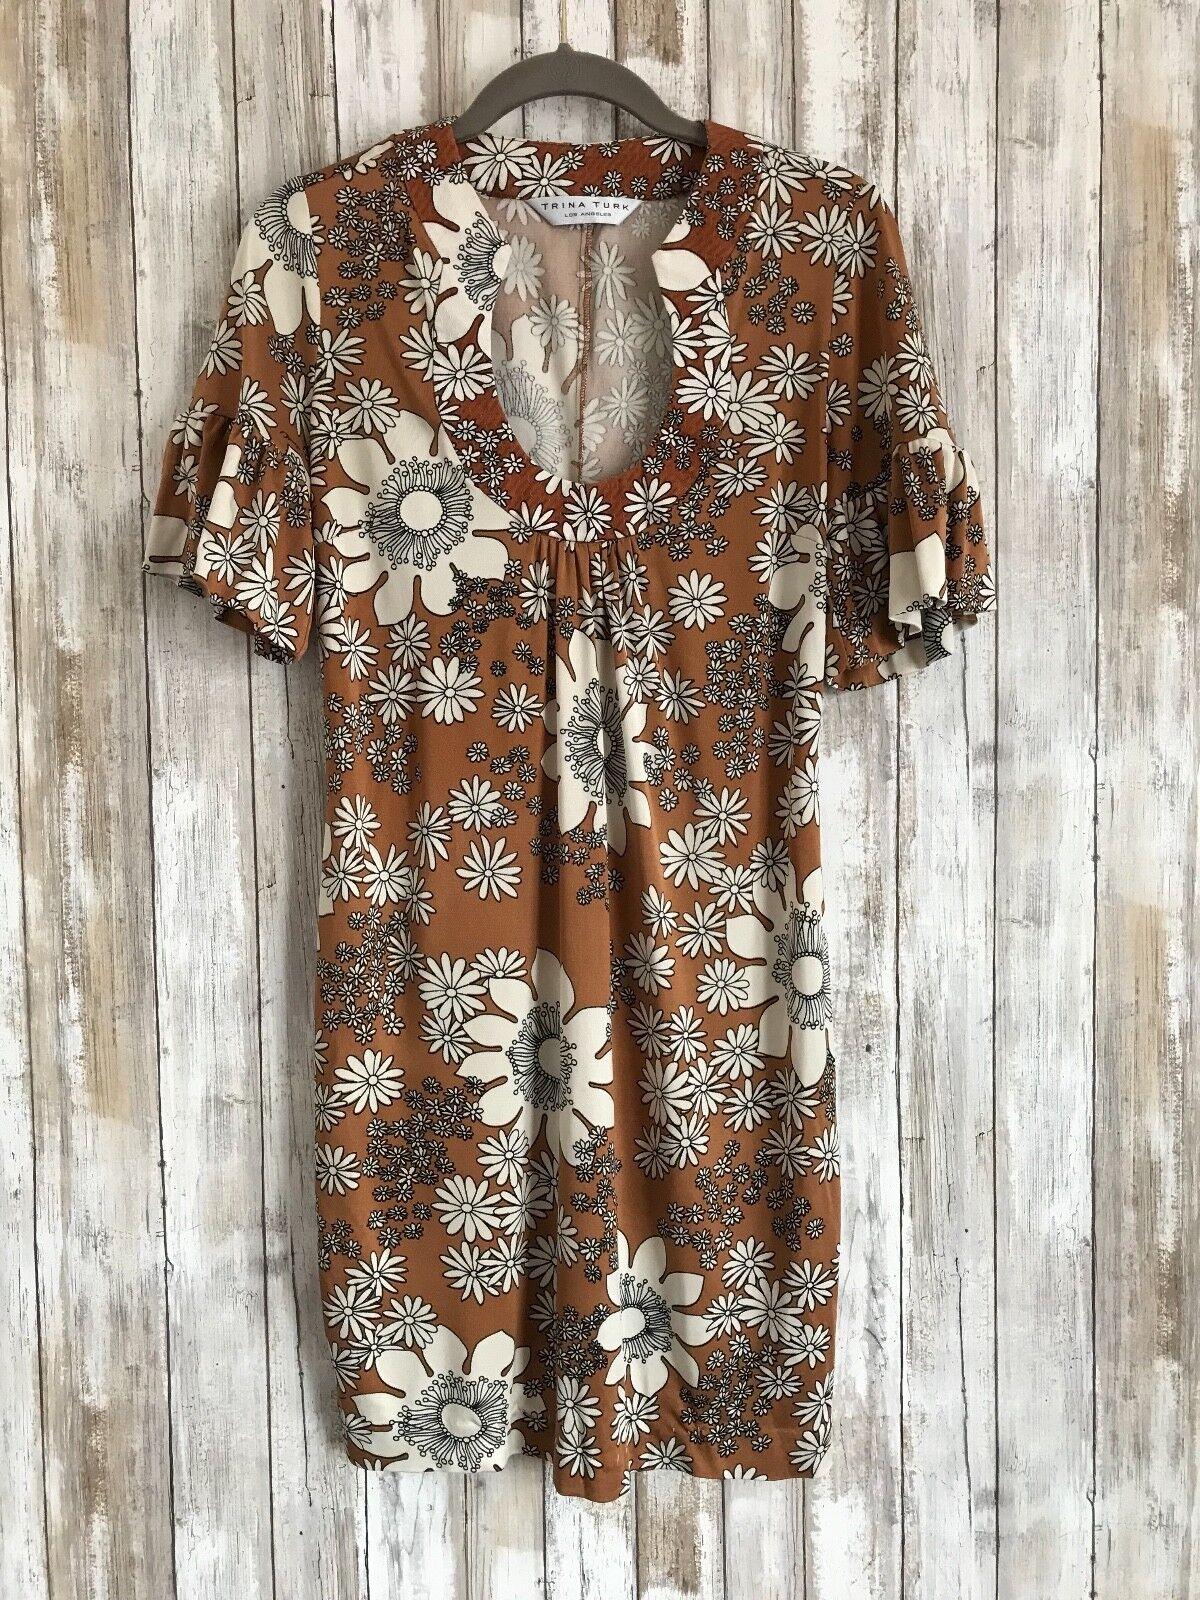 TRINA TURK Retro Hippie Boho Floral Beige Silk Shift Tunic Dress S Small RARE